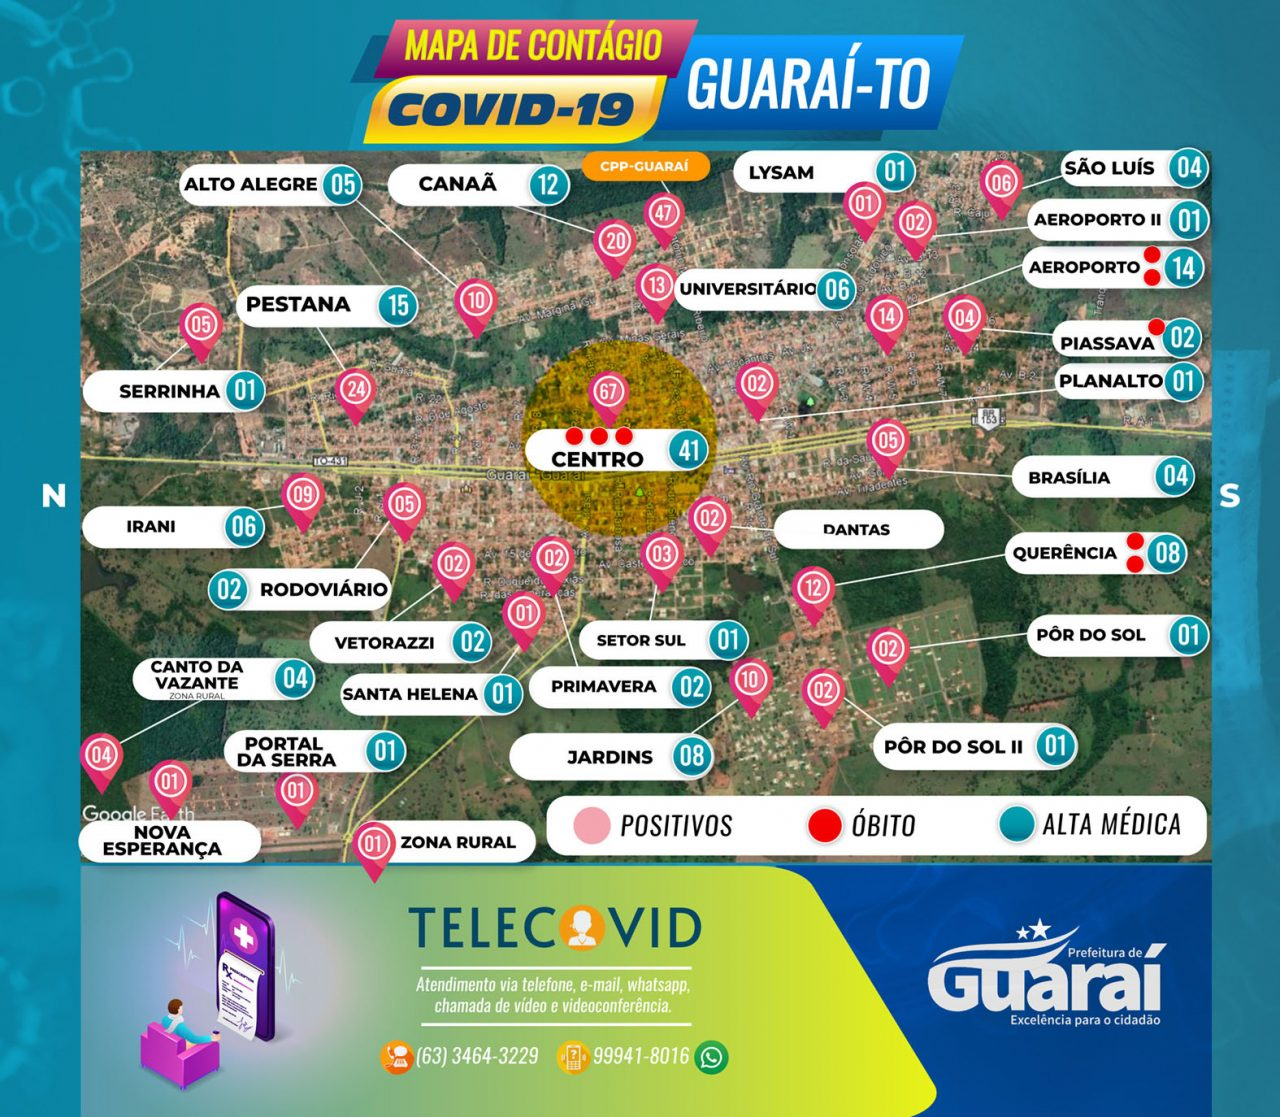 MAPA GUARAI COVID19 QUINTA 9 DE JULHO 1280x1117 - Painel Guaraí-TO / Covid-19 / Boletim 09 de Julho (Quinta) 14:00